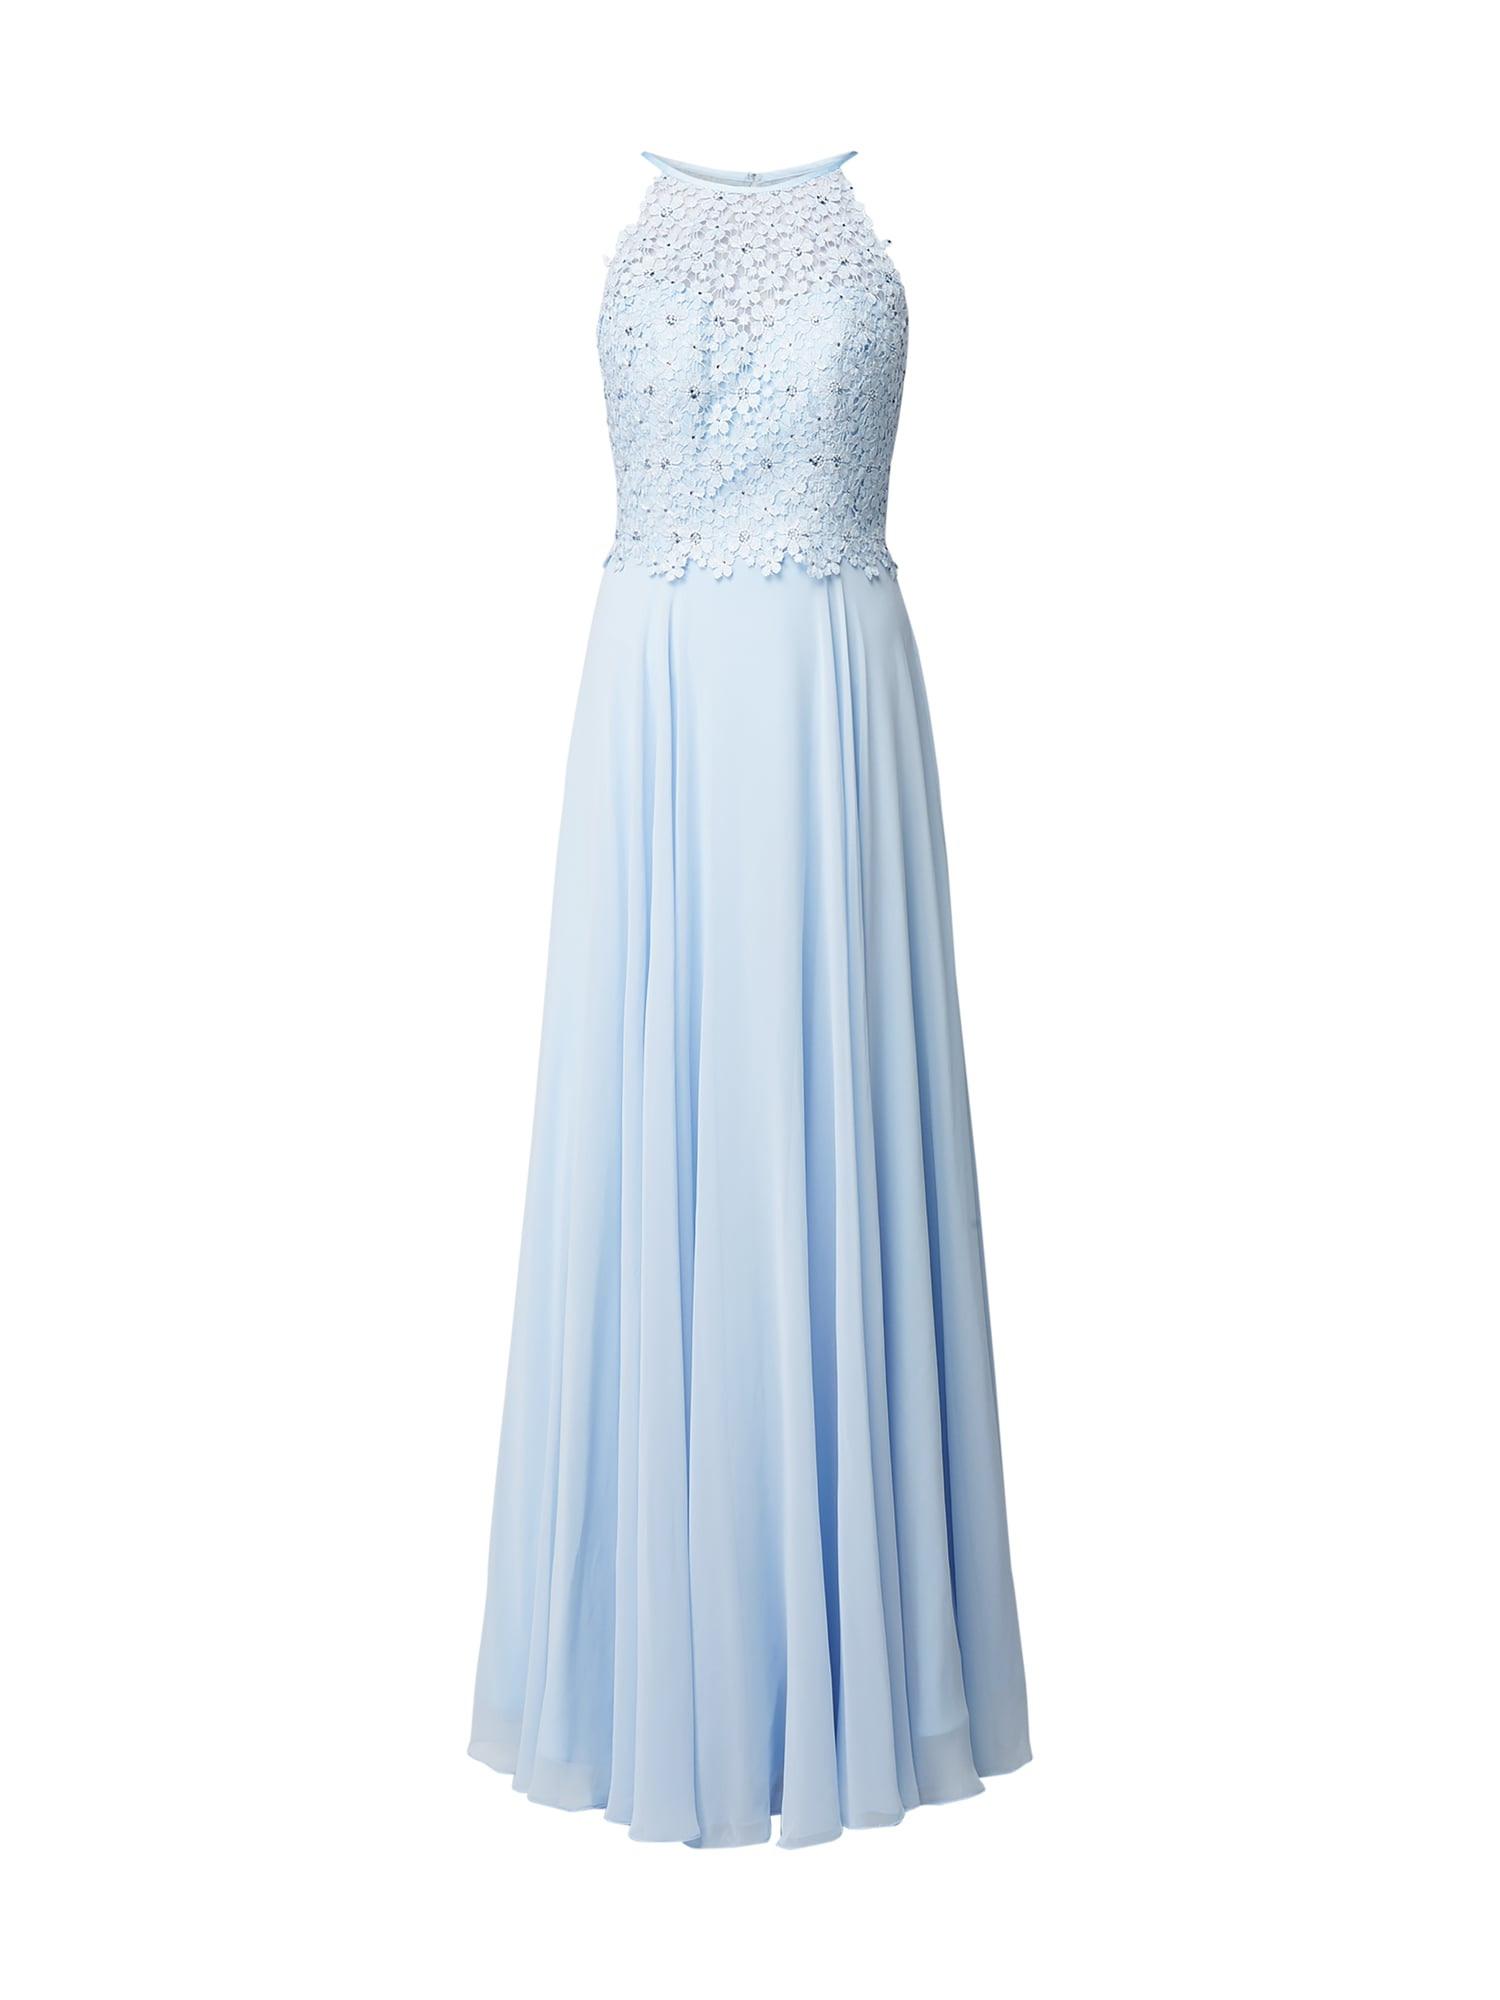 Designer Wunderbar Kleid Hellblau Lang für 2019Abend Ausgezeichnet Kleid Hellblau Lang Design